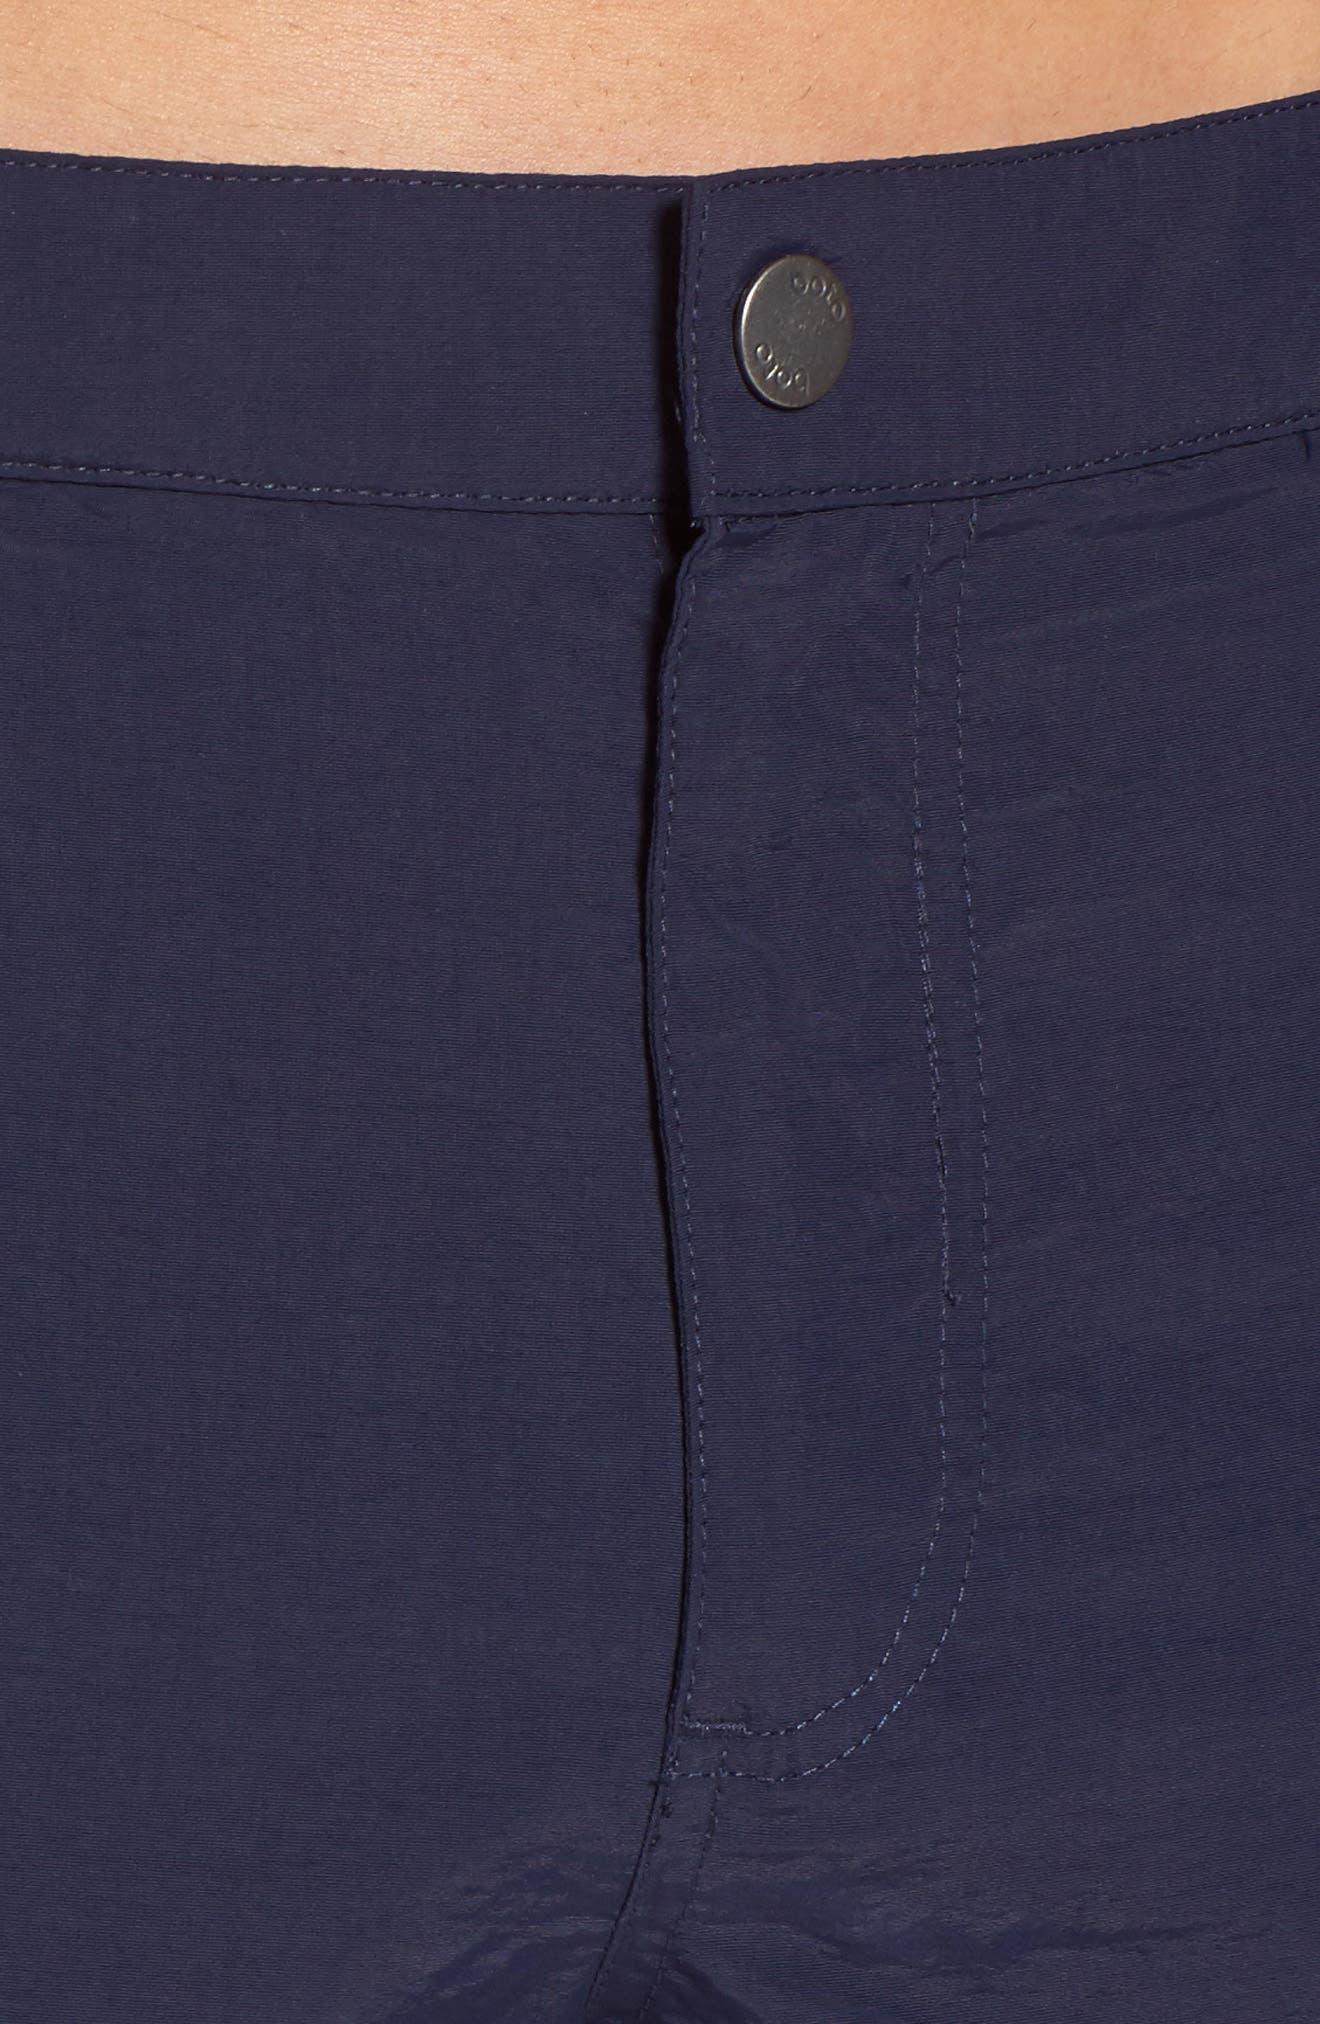 Aruba Tailored Fit French Stripe Swim Trunks,                             Alternate thumbnail 4, color,                             Navy French Stripes